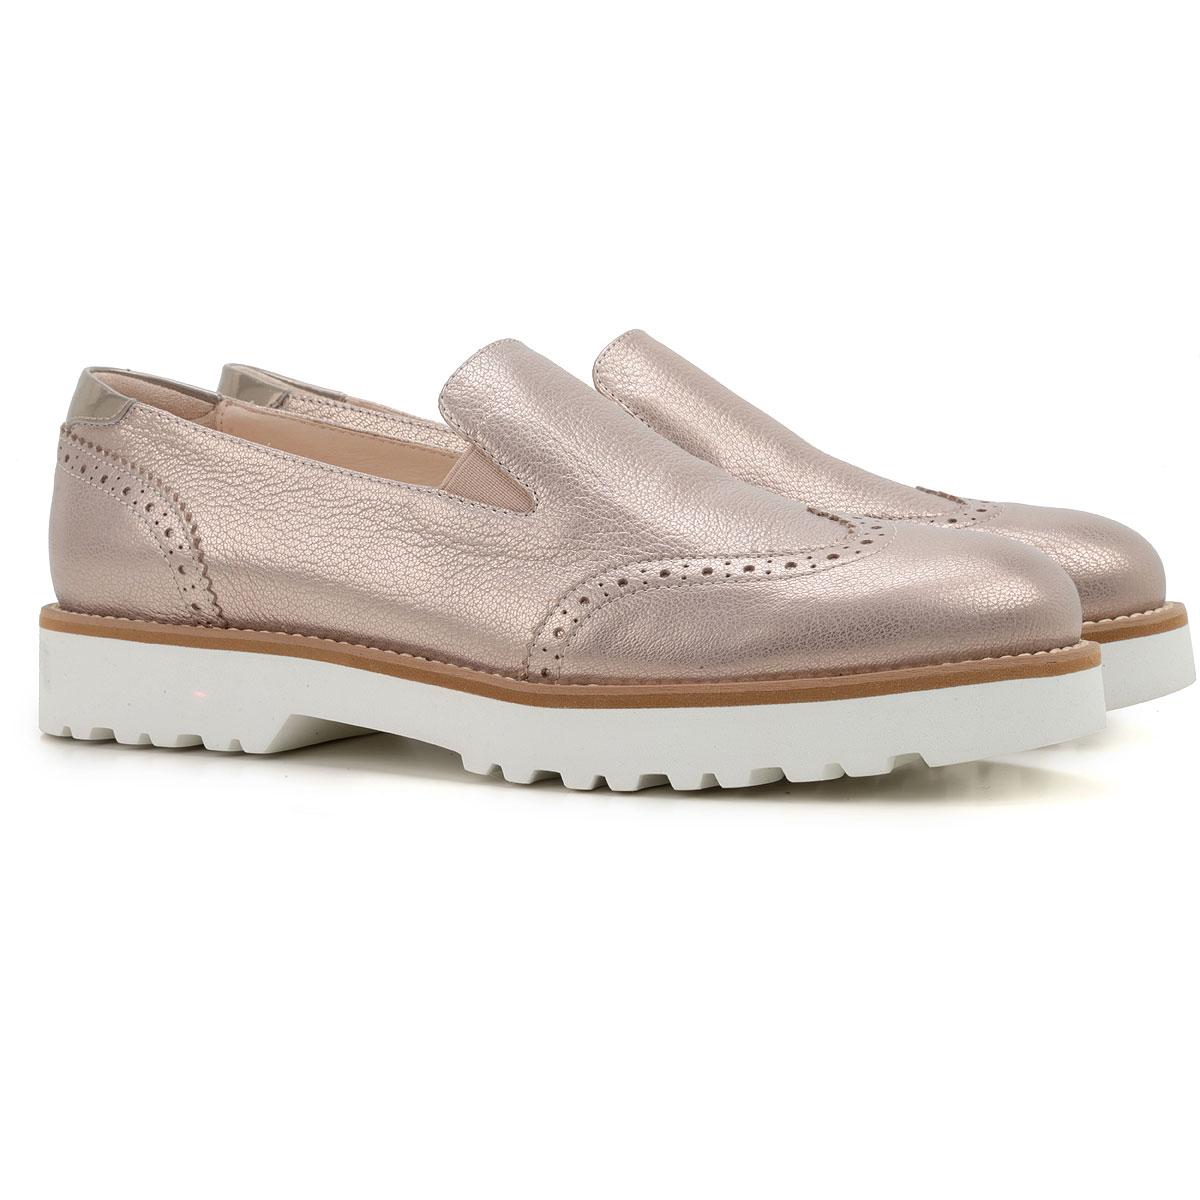 chaussures femme hogan code produit hxw2590r330cj6m024. Black Bedroom Furniture Sets. Home Design Ideas